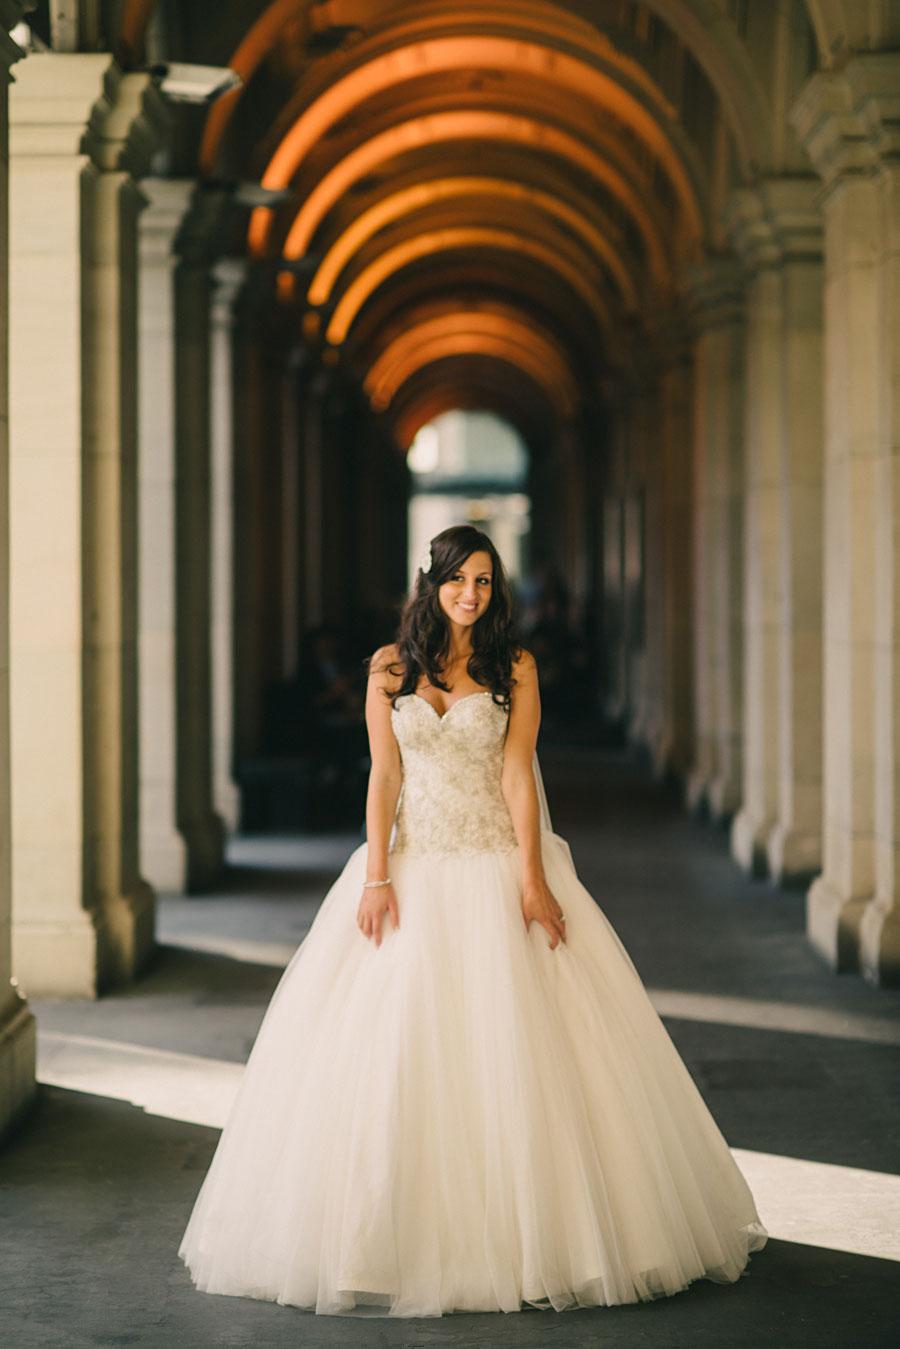 wedding-photography-melbourne-daniel-bilsborough-167.jpg